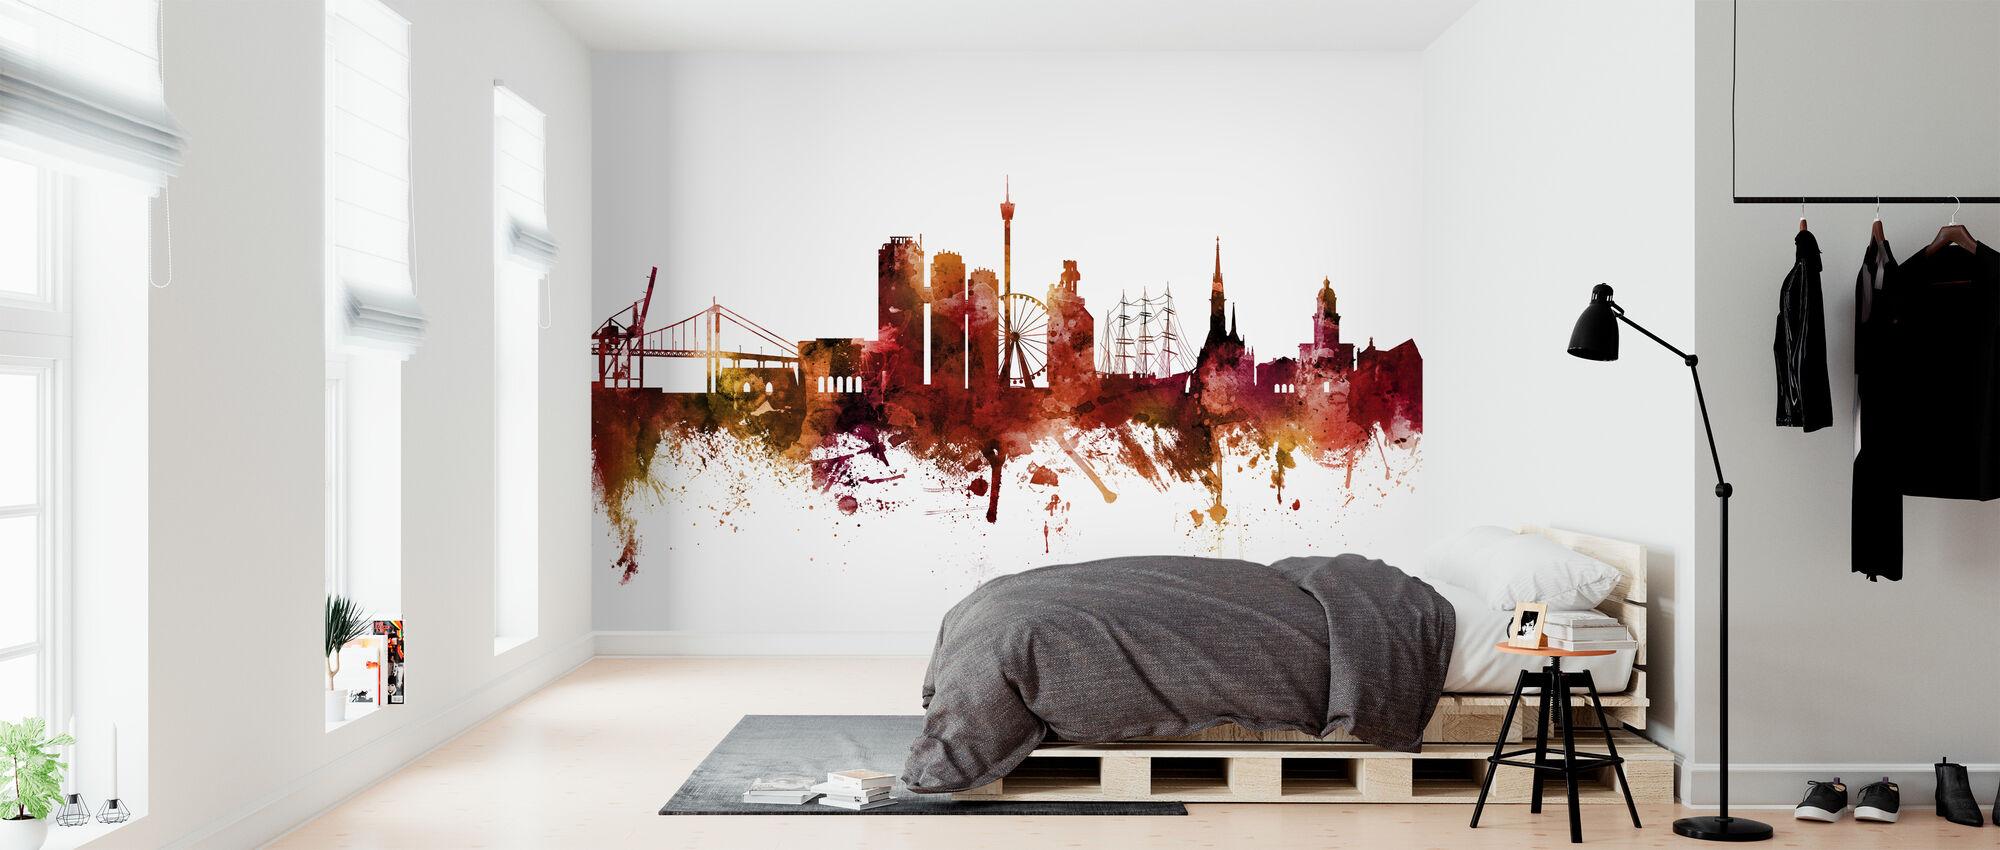 Gothenburg Sweden Skyline - Wallpaper - Bedroom